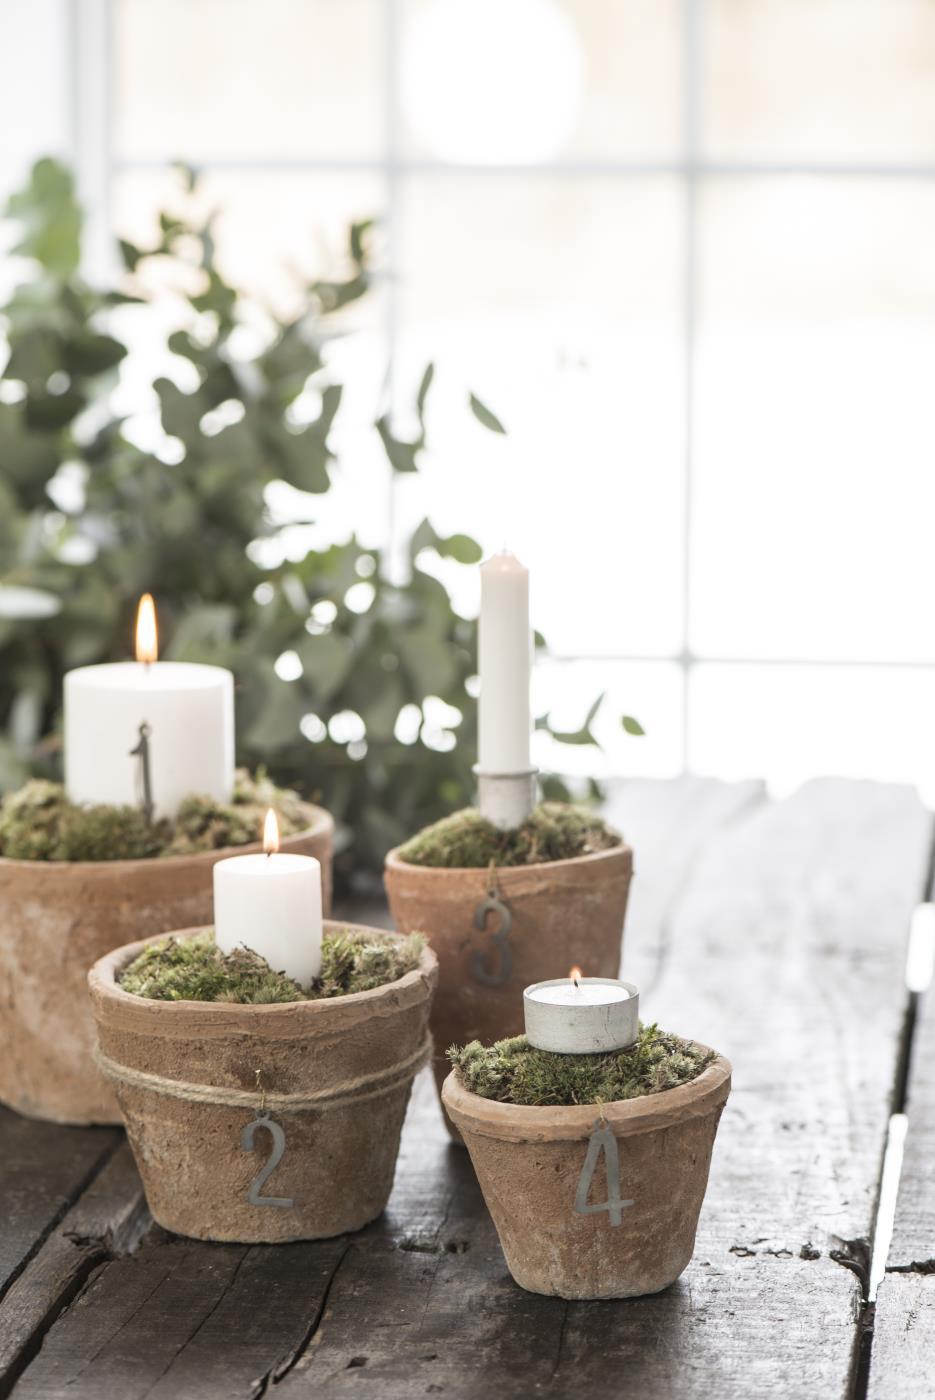 Kerzen von IB Laursen aus Dänemark, Bild 1